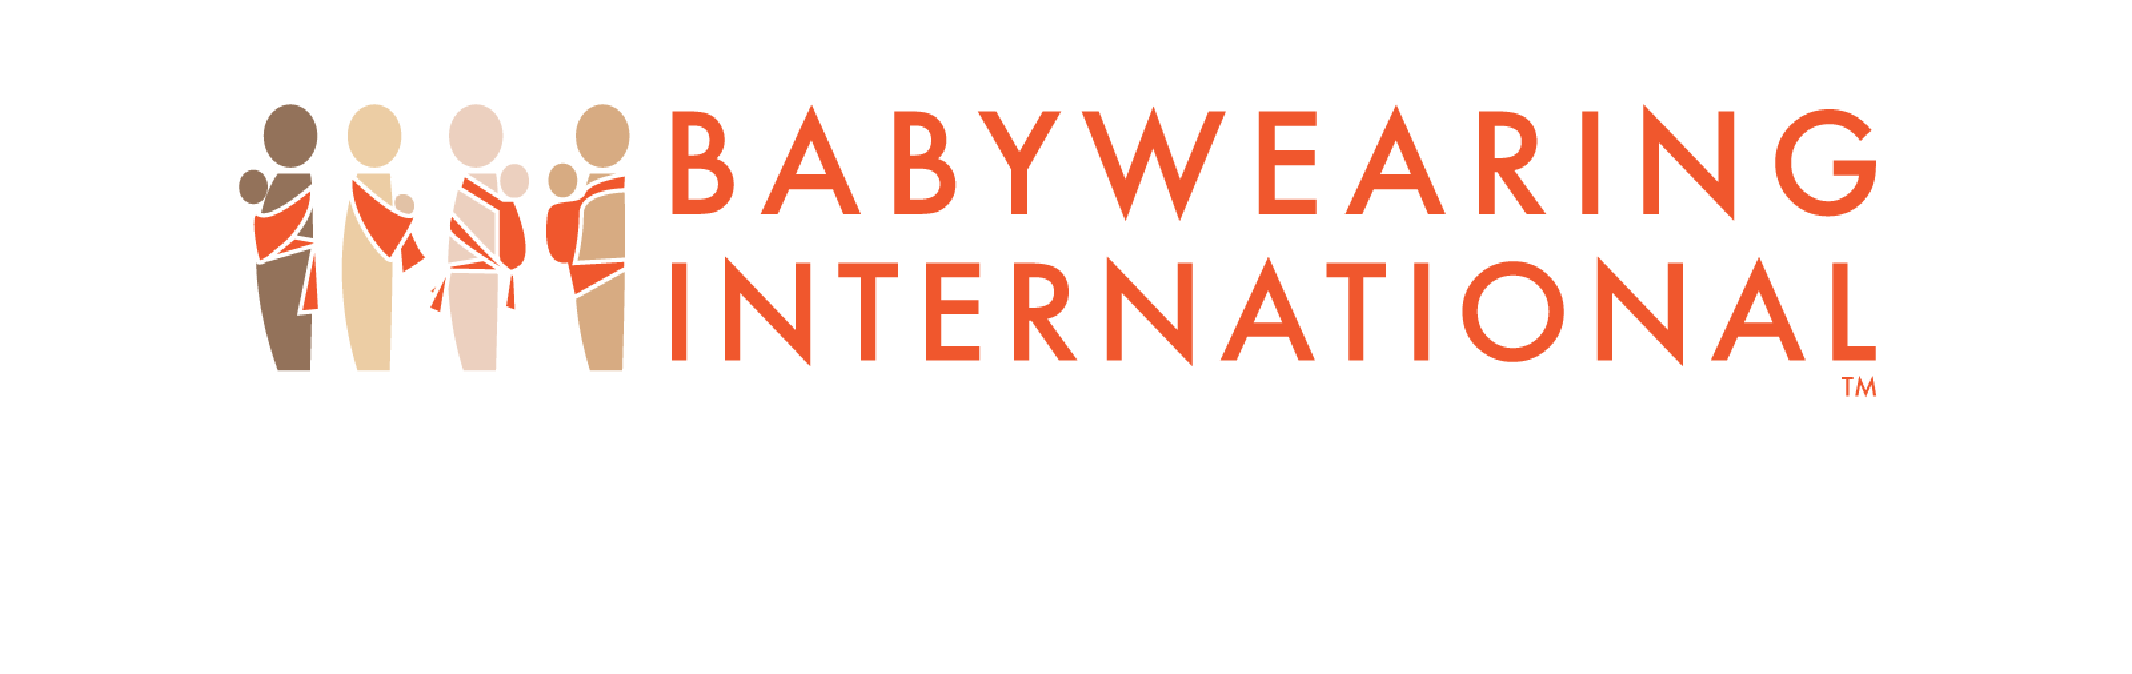 Babywear International.png